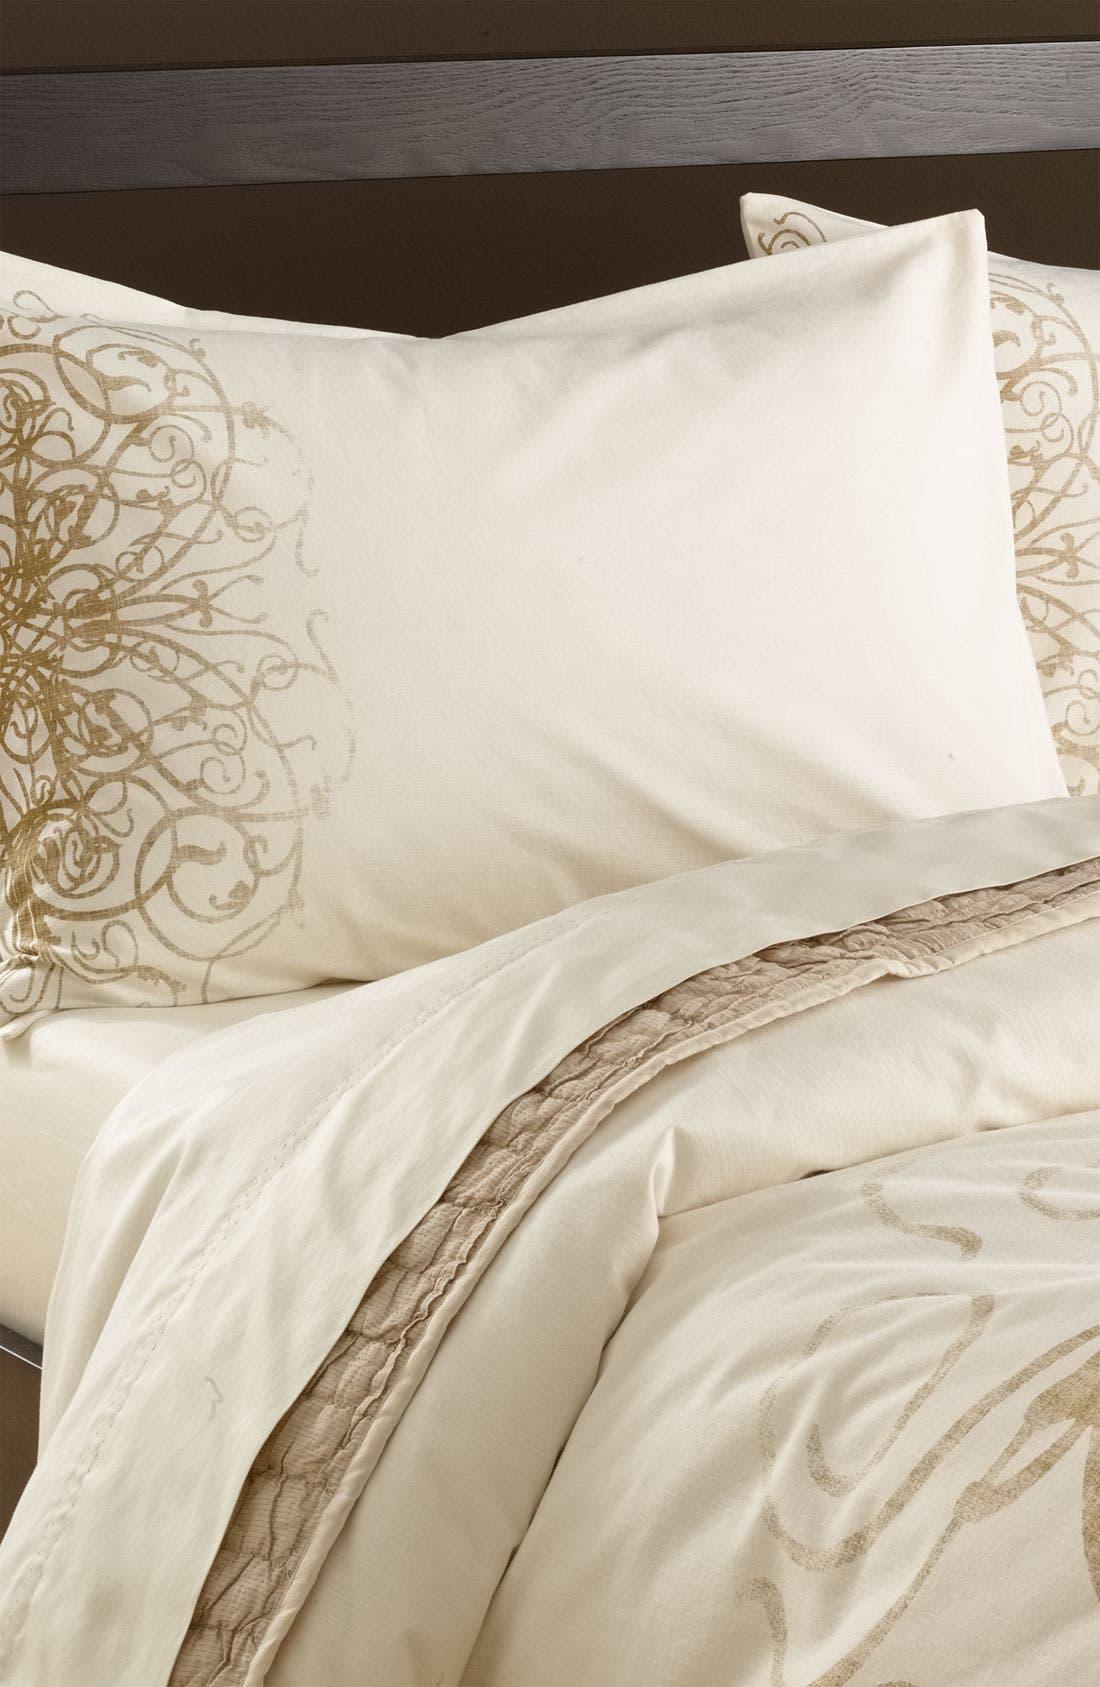 Main Image - Nordstrom at Home 'Hidden Treasures' Pillow Sham